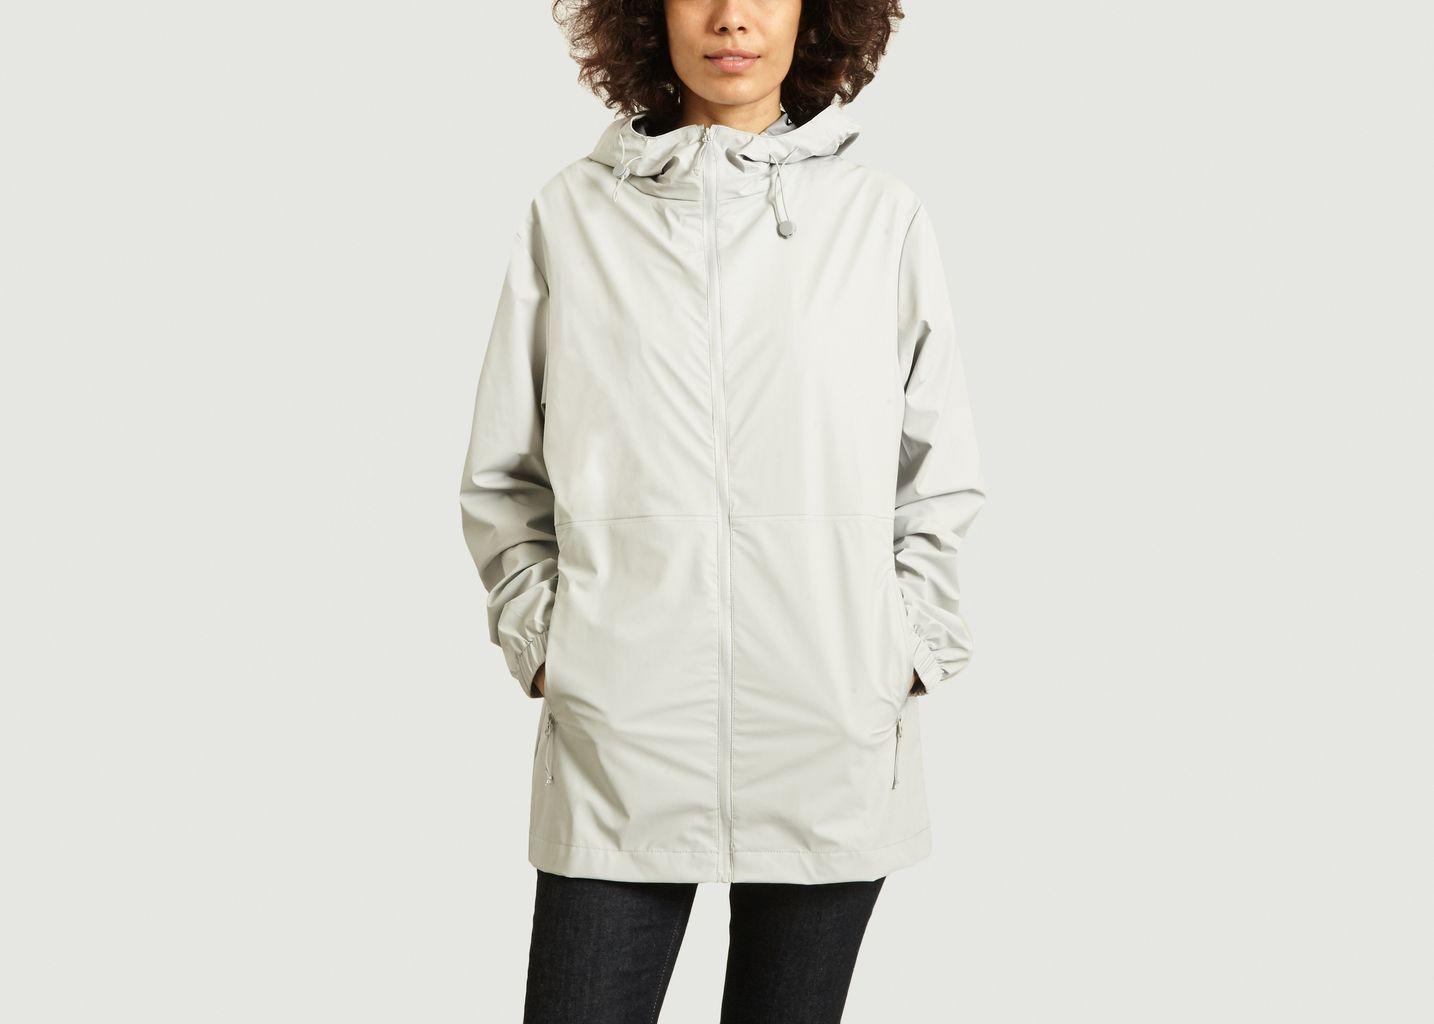 Ultralight Jacket - Rains